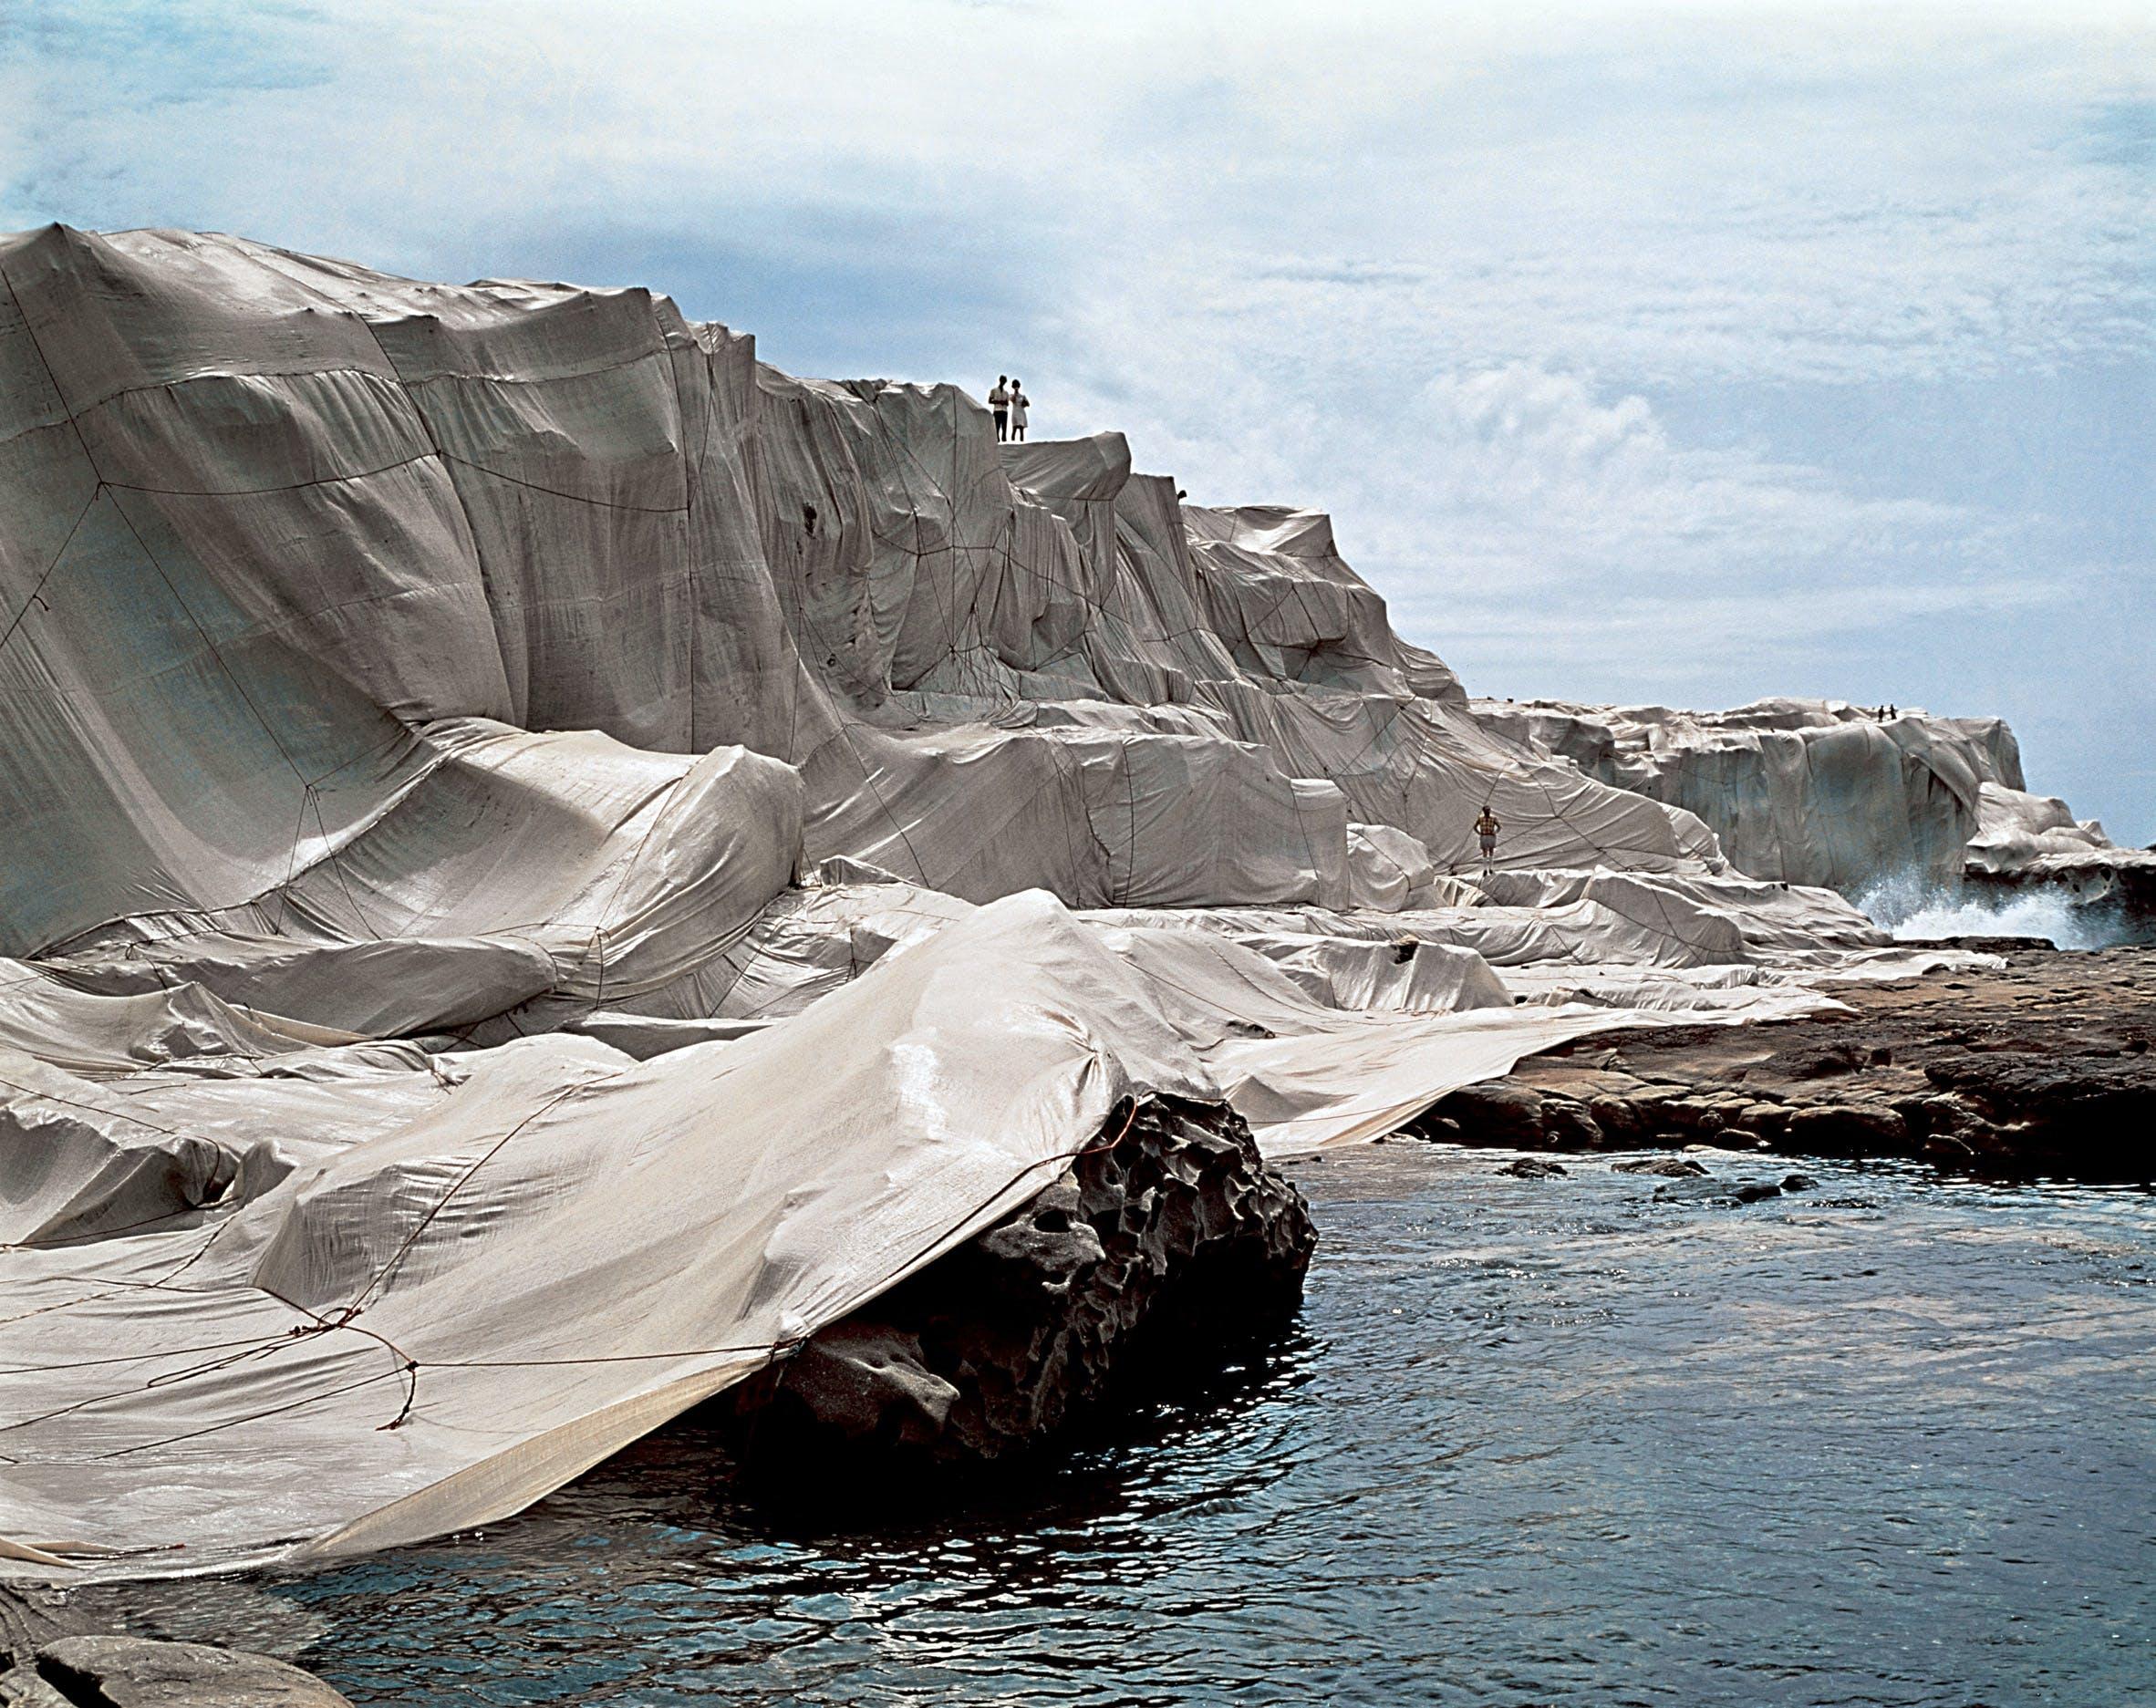 Wrapped Coast, One Million Square Feet, Little Bay, Sydney, Australia, 1969.